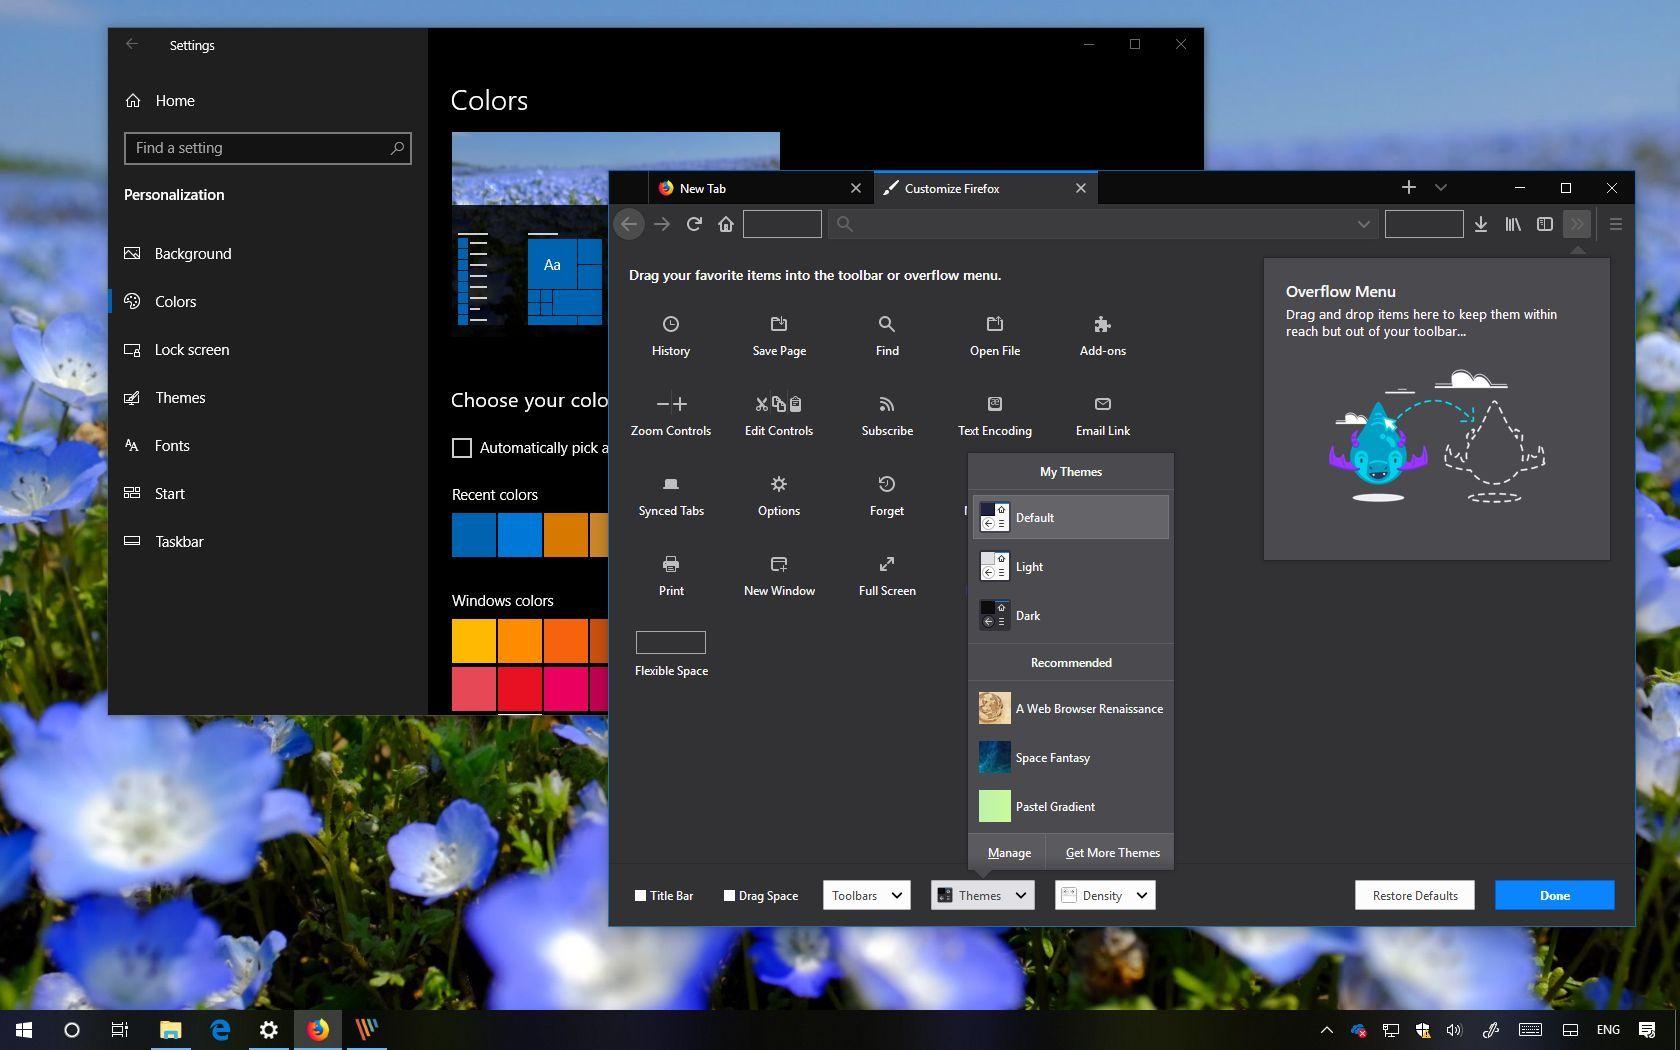 Mozilla Firefox theme settings on Windows 10